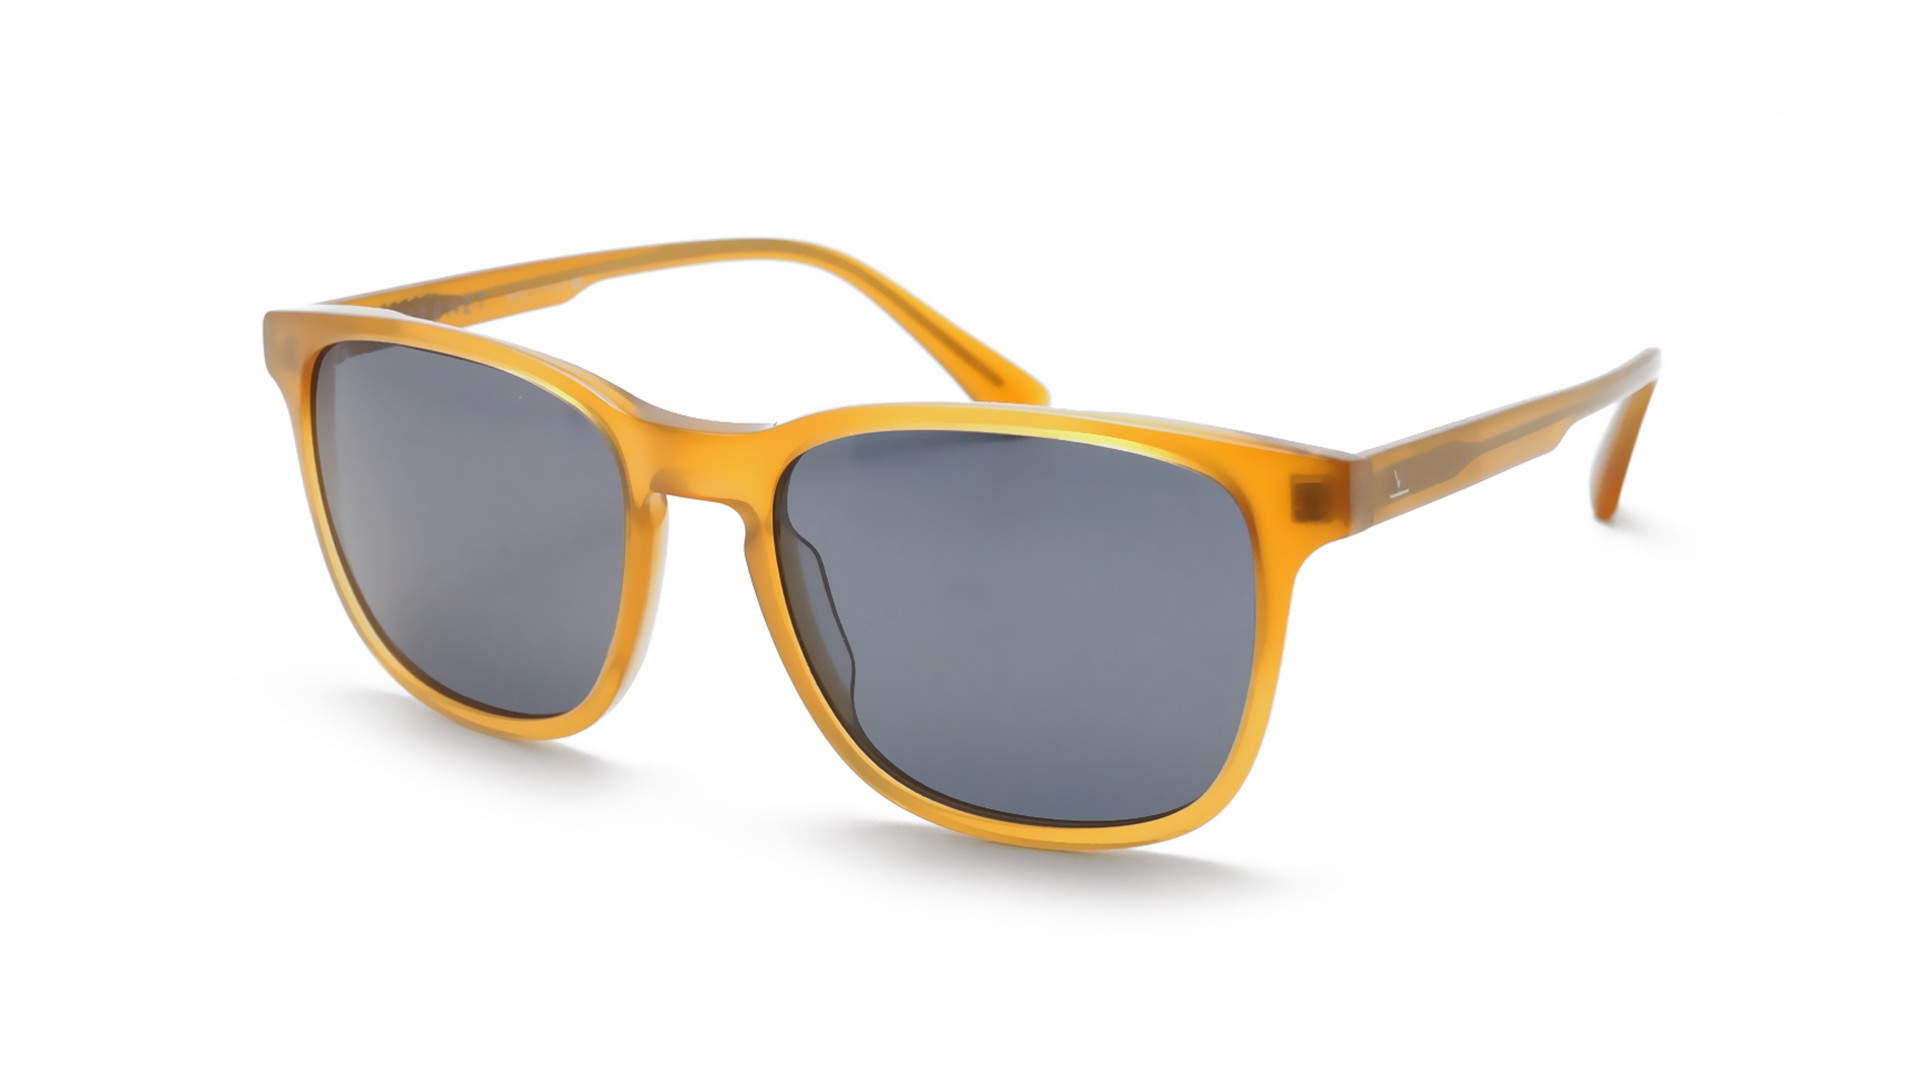 782c22e70d Sunglasses Vuarnet District Square Brown VL1618 0005 53-15 Medium Polarized